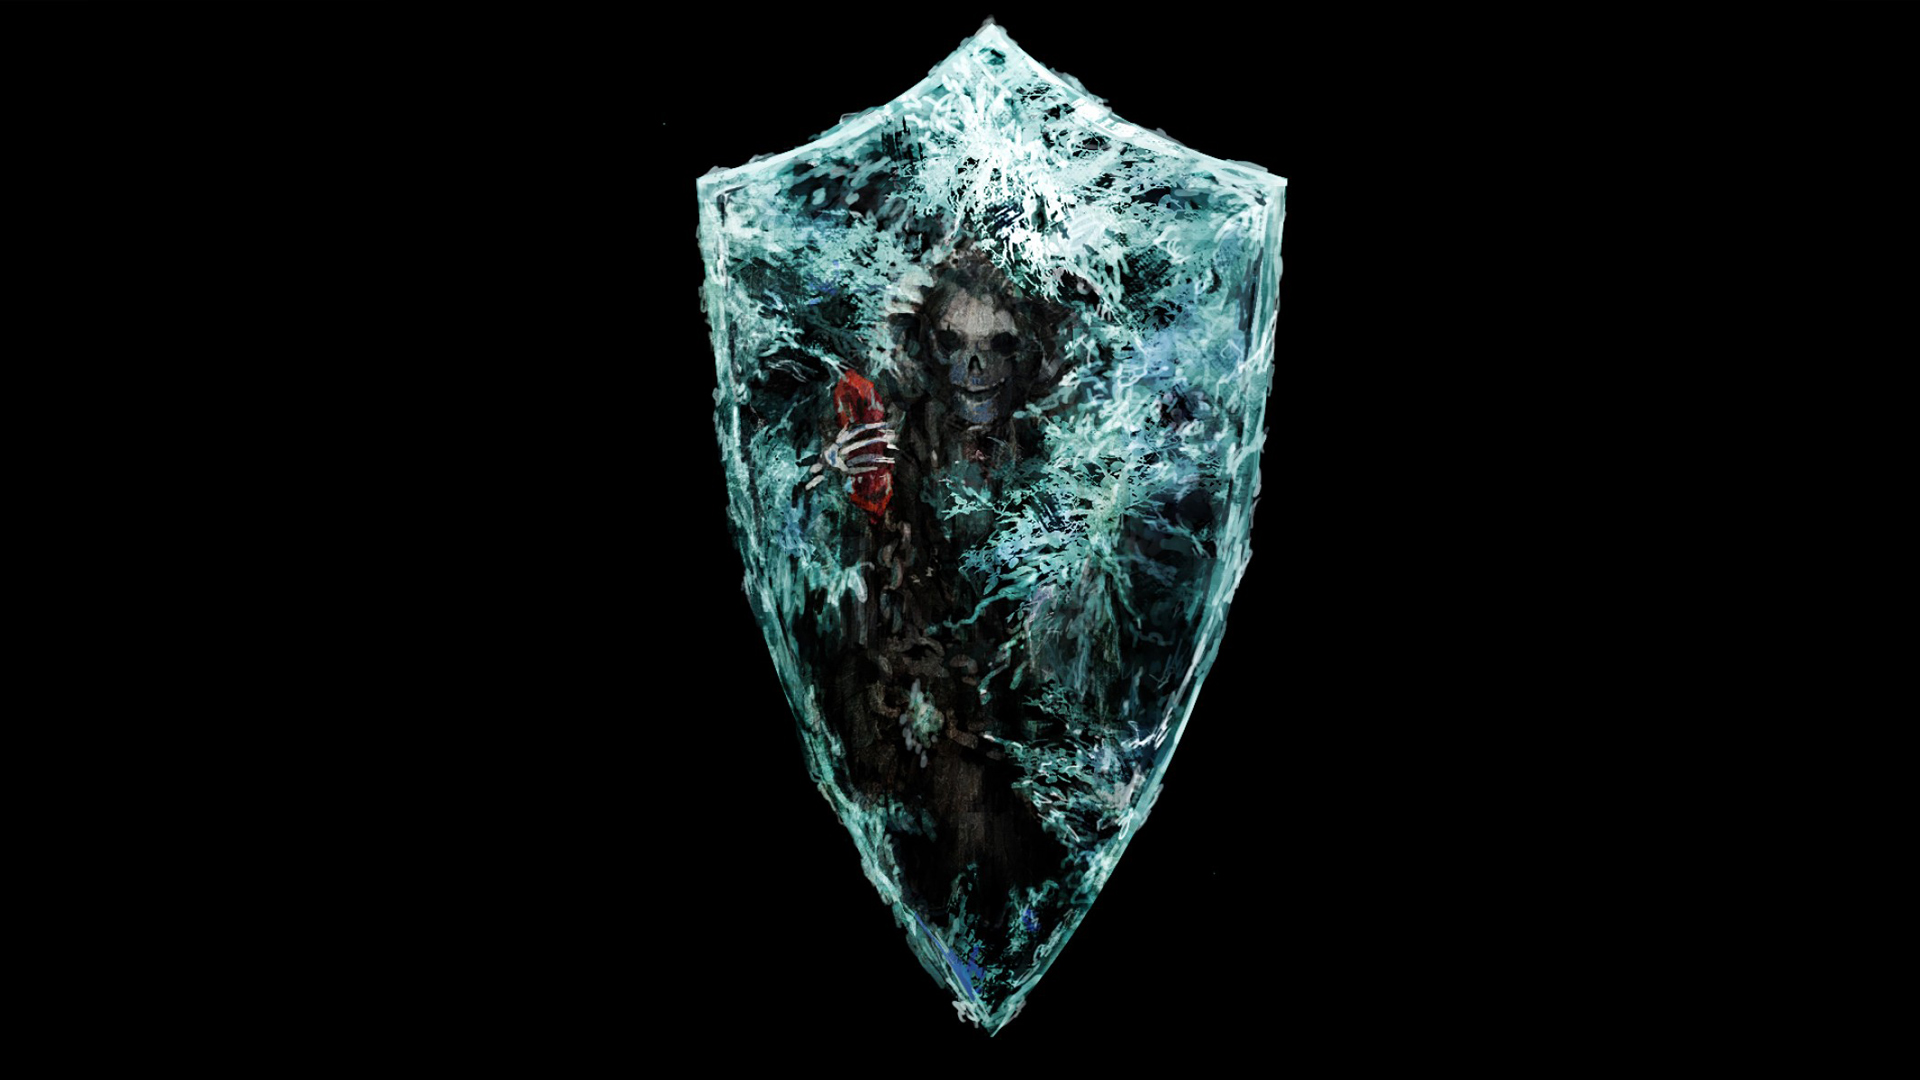 dark souls 2 II game hd wallpaper image picture photo 1920x1080